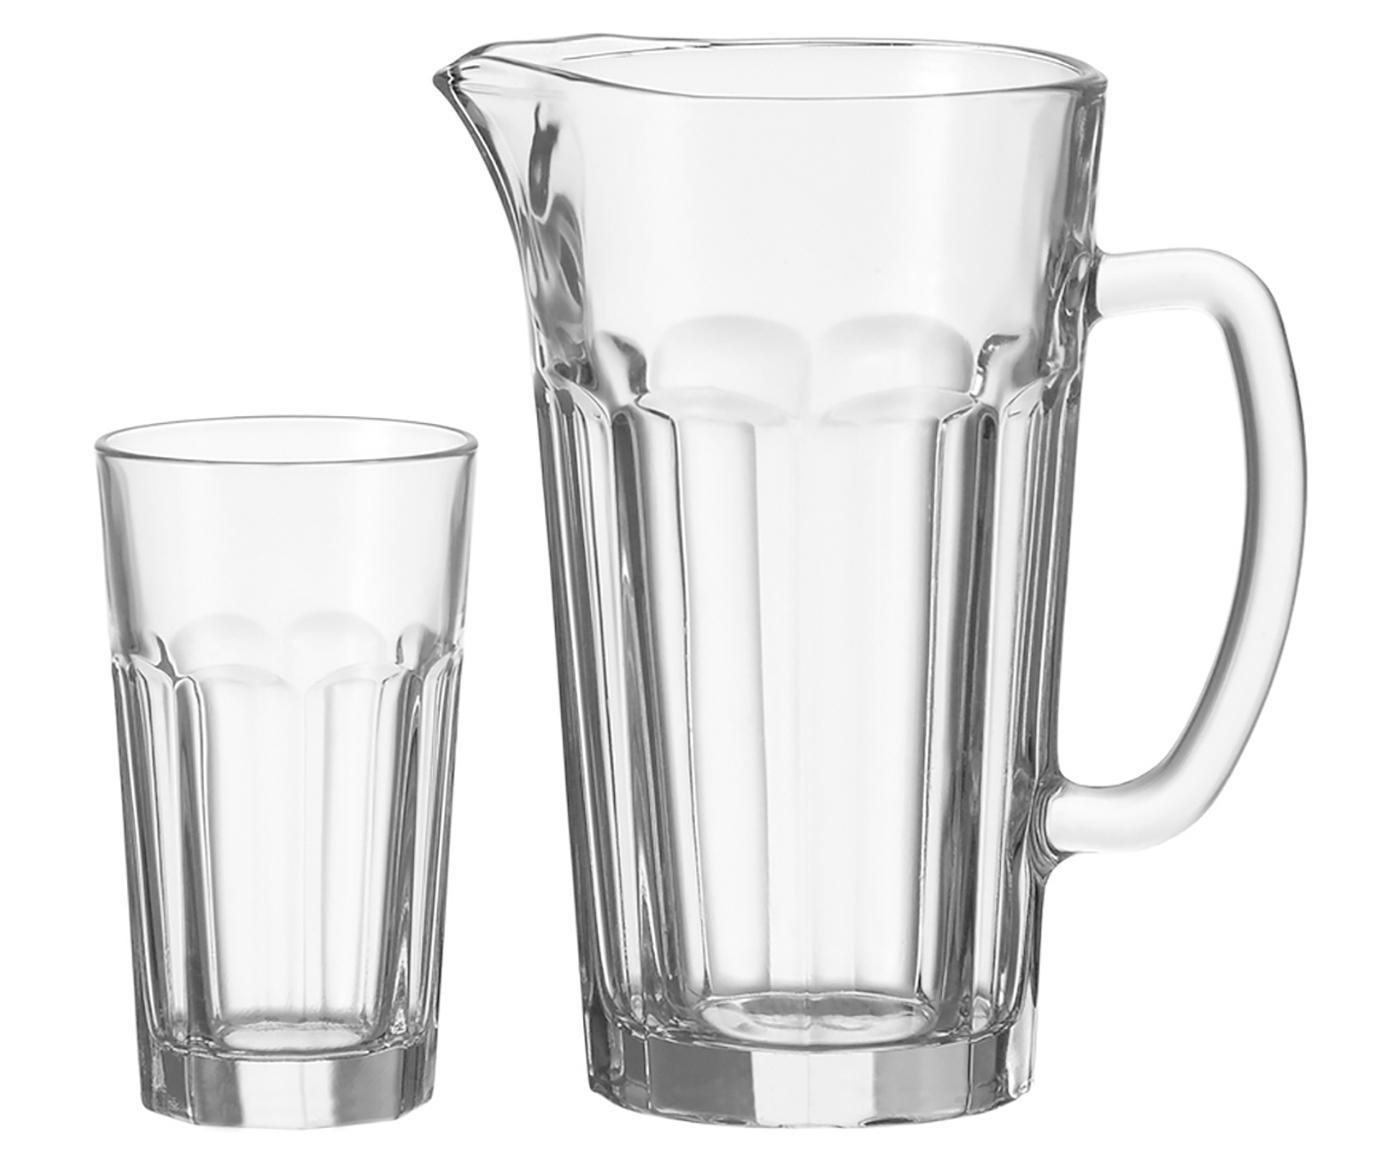 Dzbanek ze szklankami, 7 szt., Szkło, Transparentny, Różne rozmiary